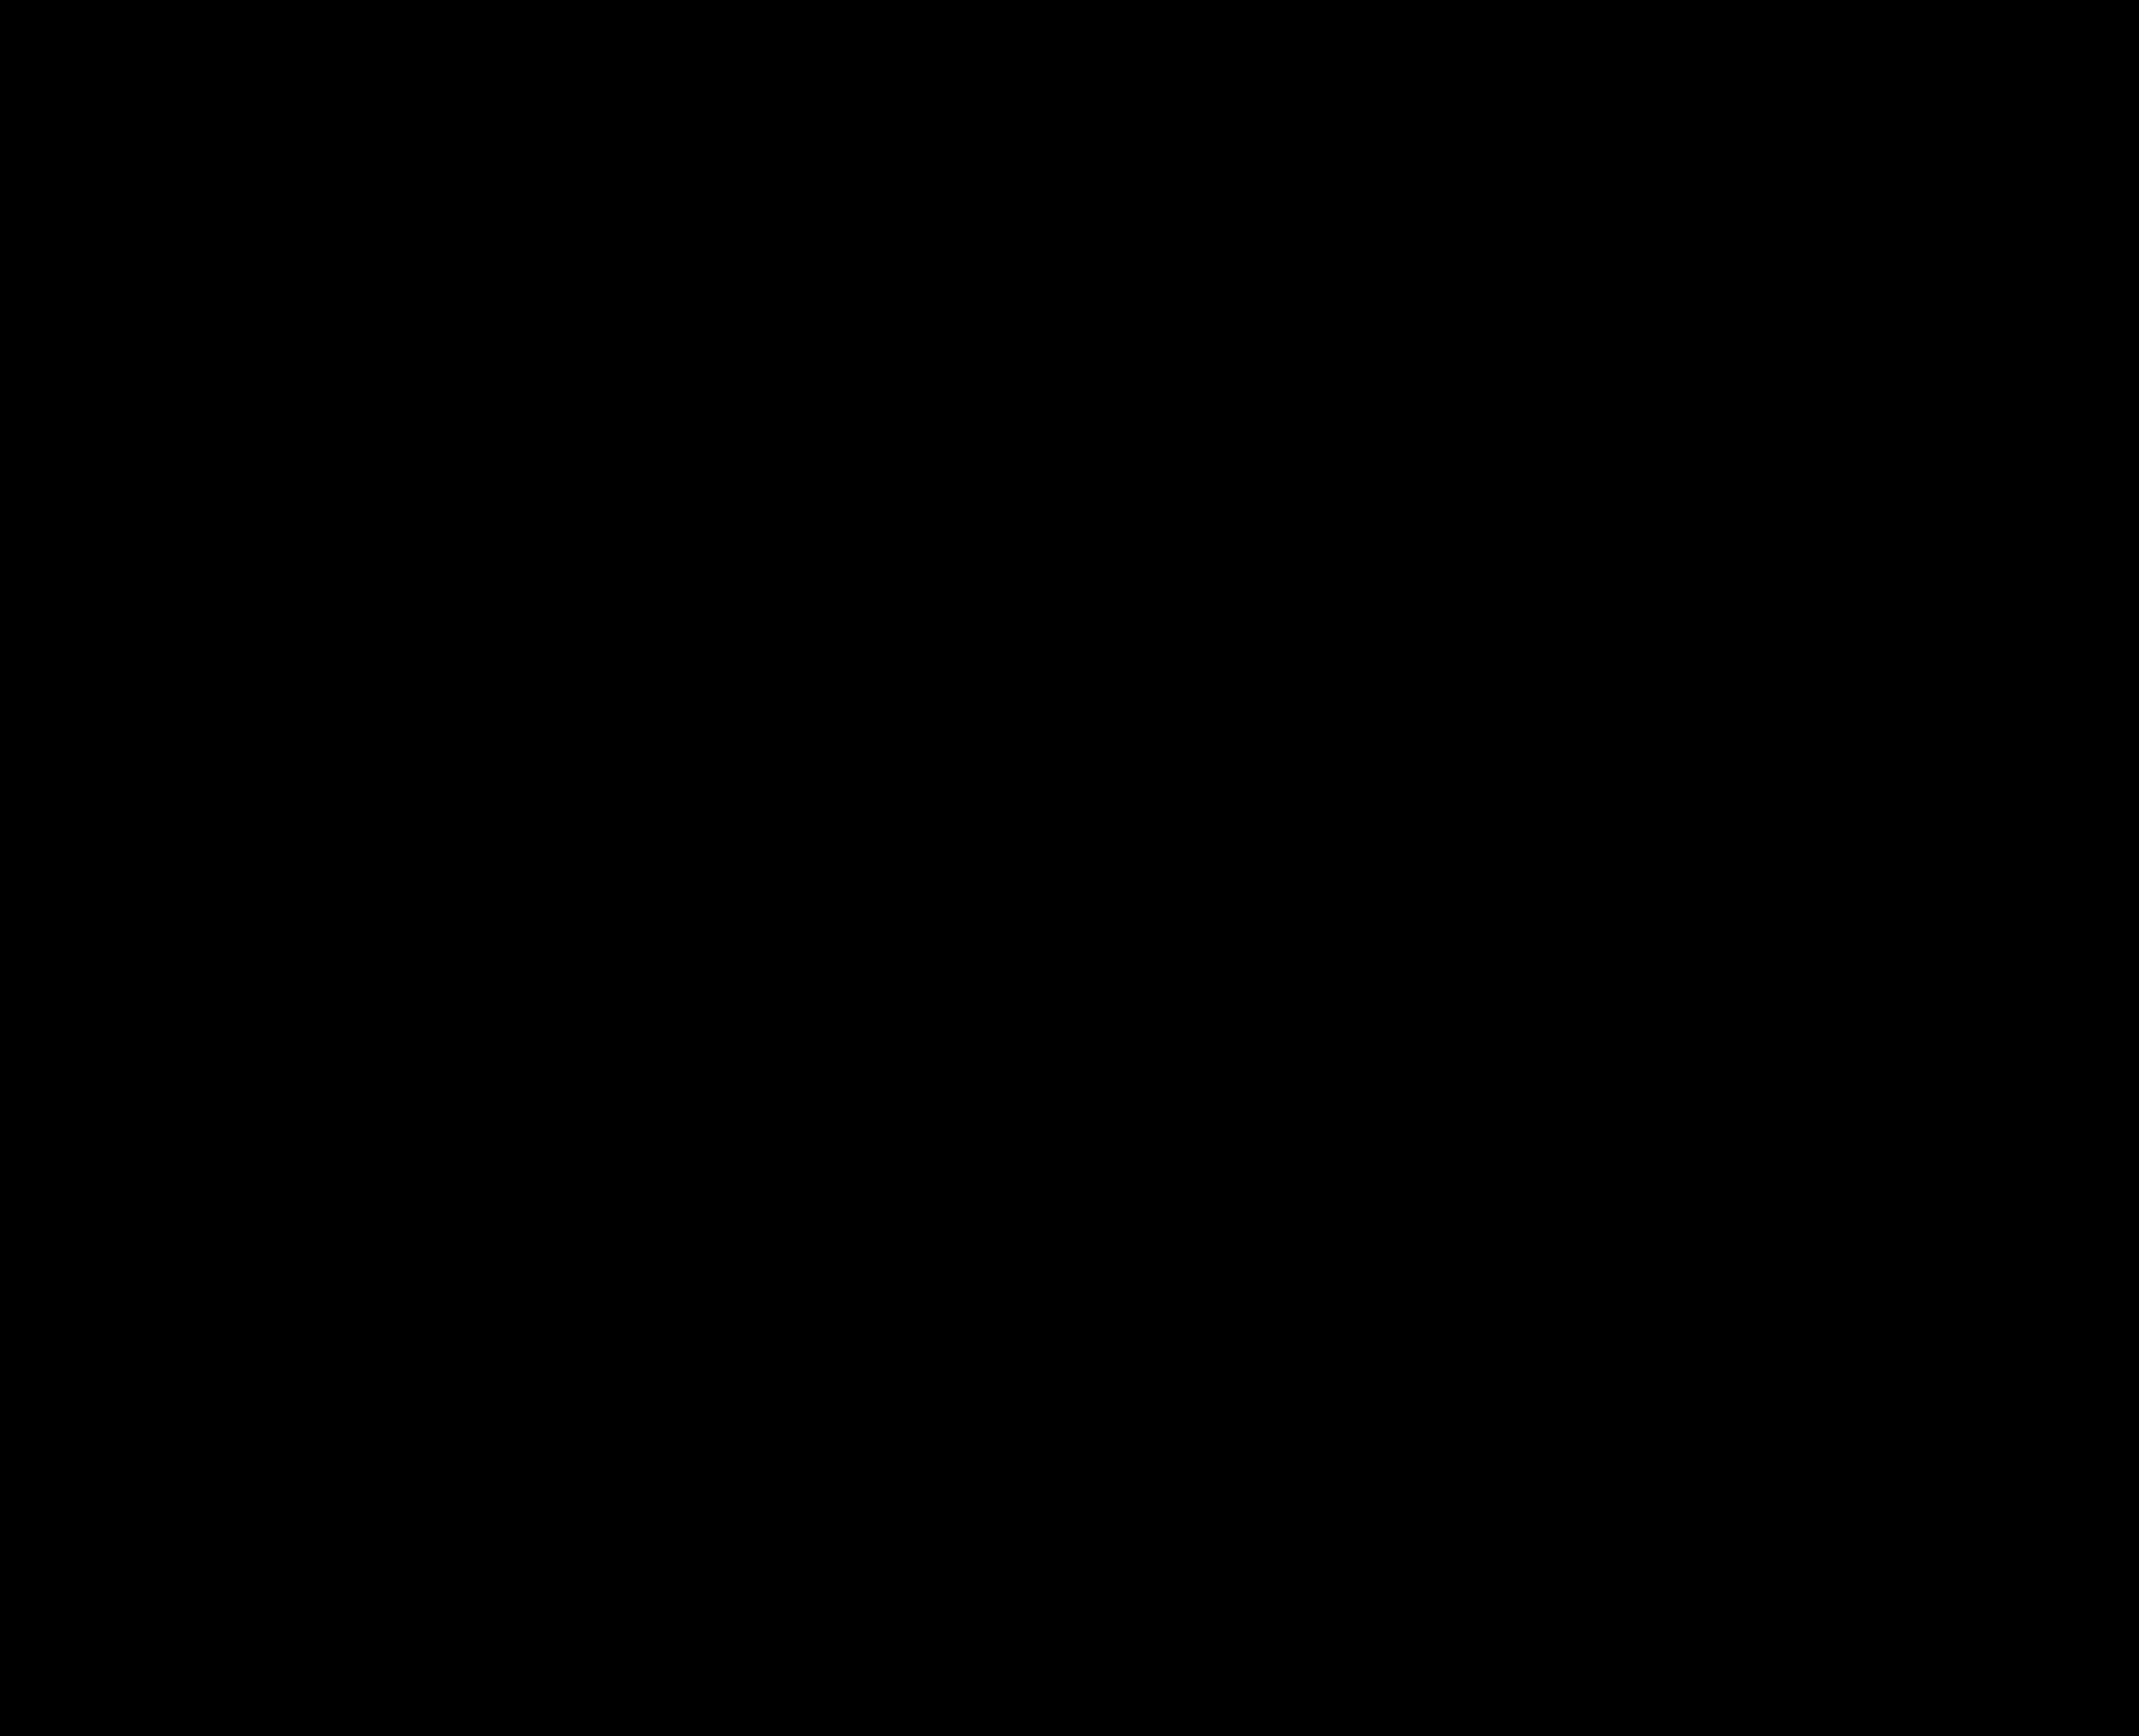 Duplo DF-755 Tabletop Folding Machine